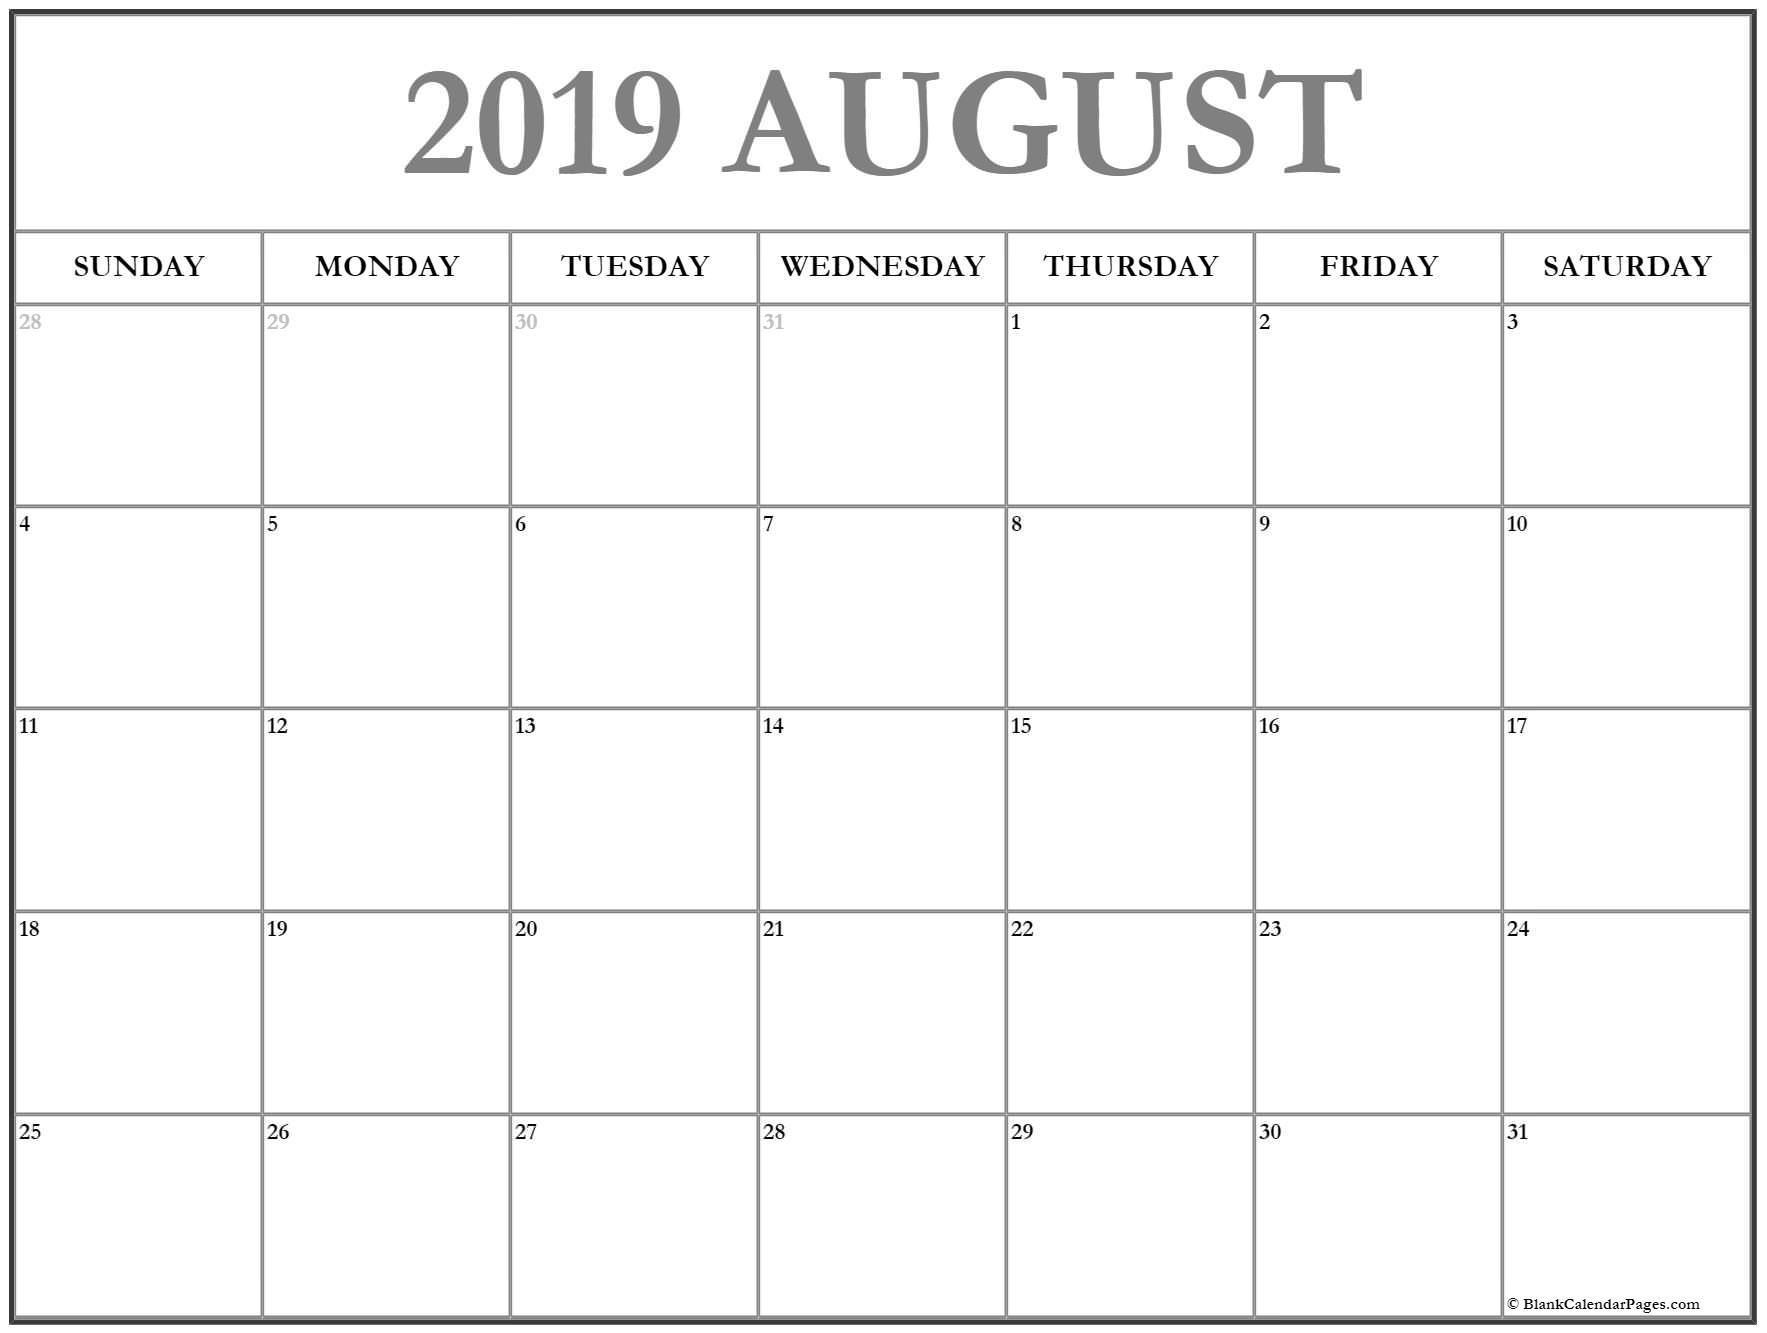 Depo Provera Perpetual Calendar 2019 Printable – Template